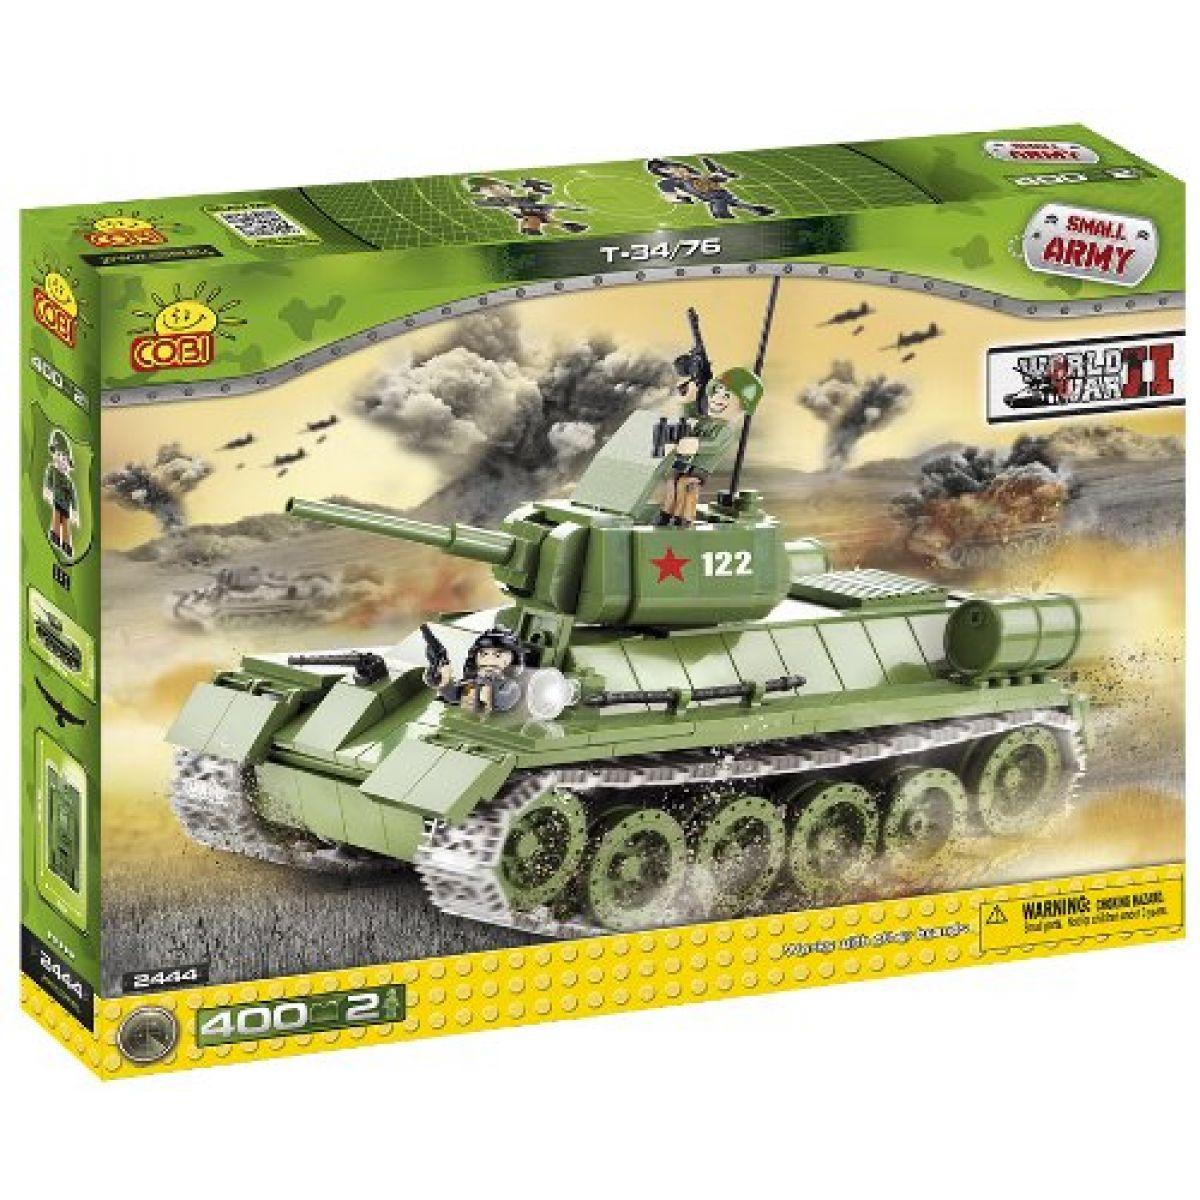 Cobi 2444 Malá armáda Tank T34 - Poškozený obal